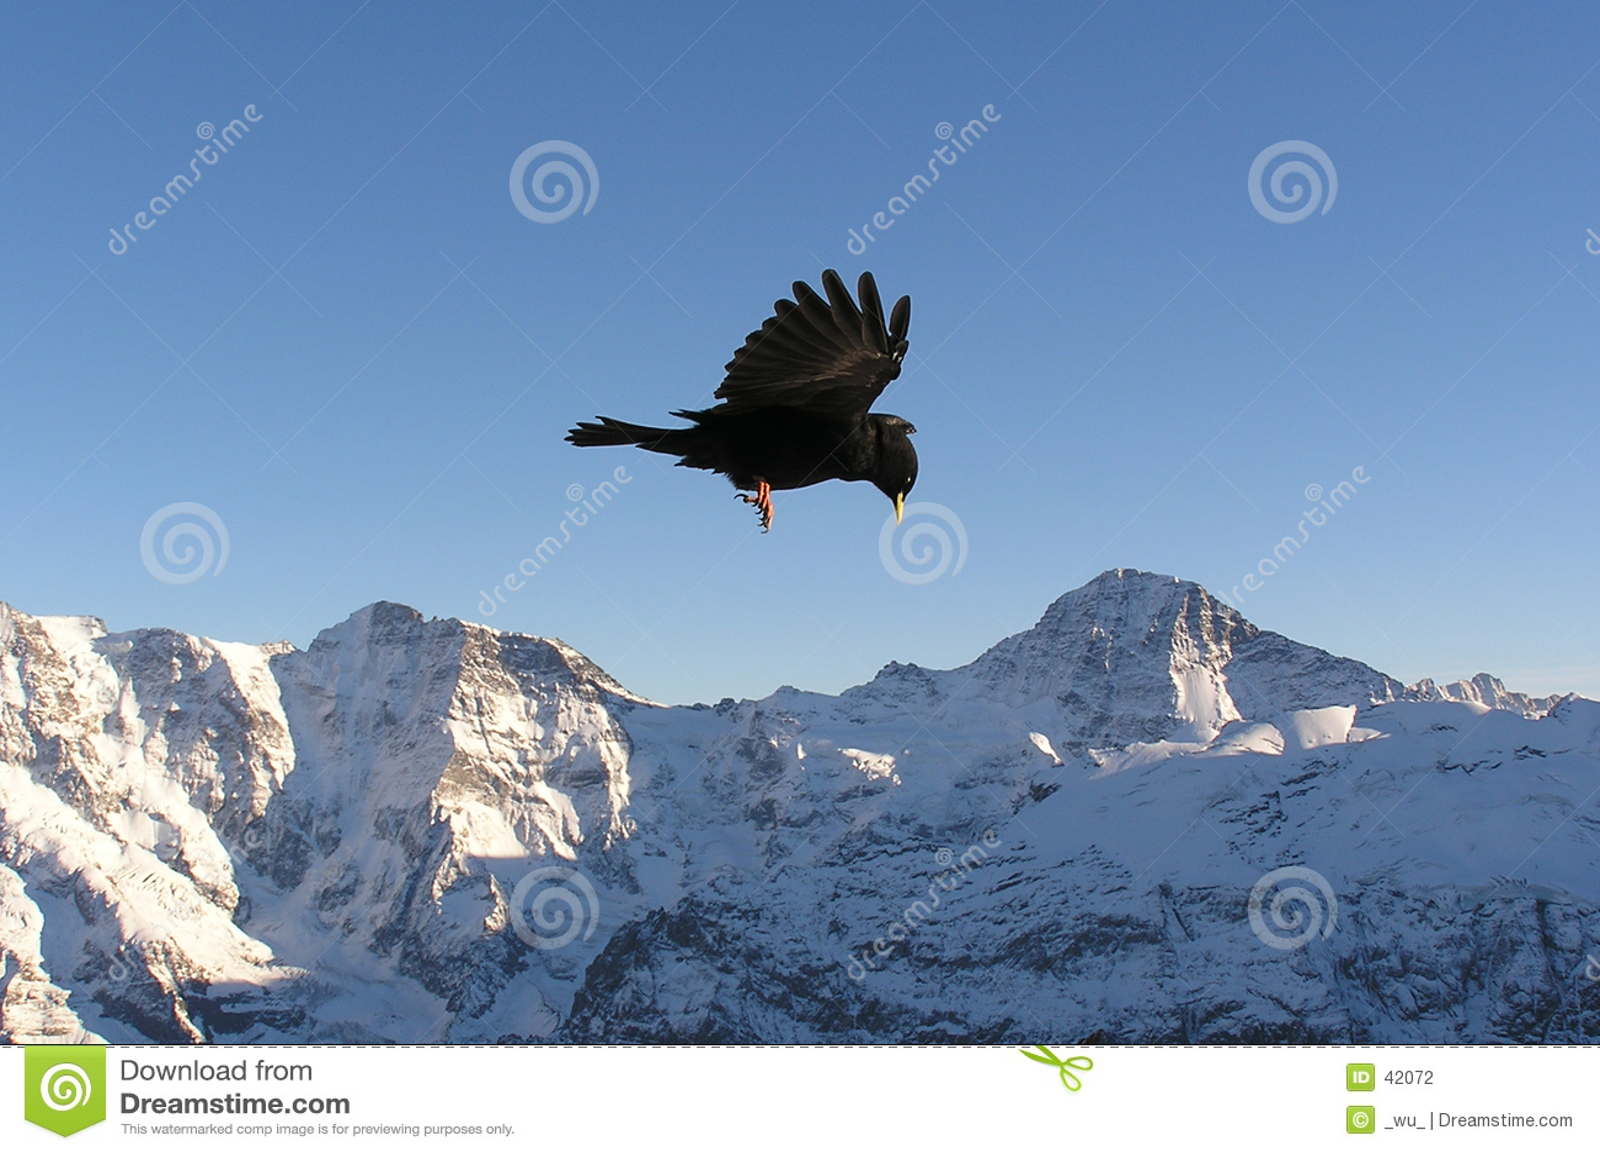 Black bird in Alps